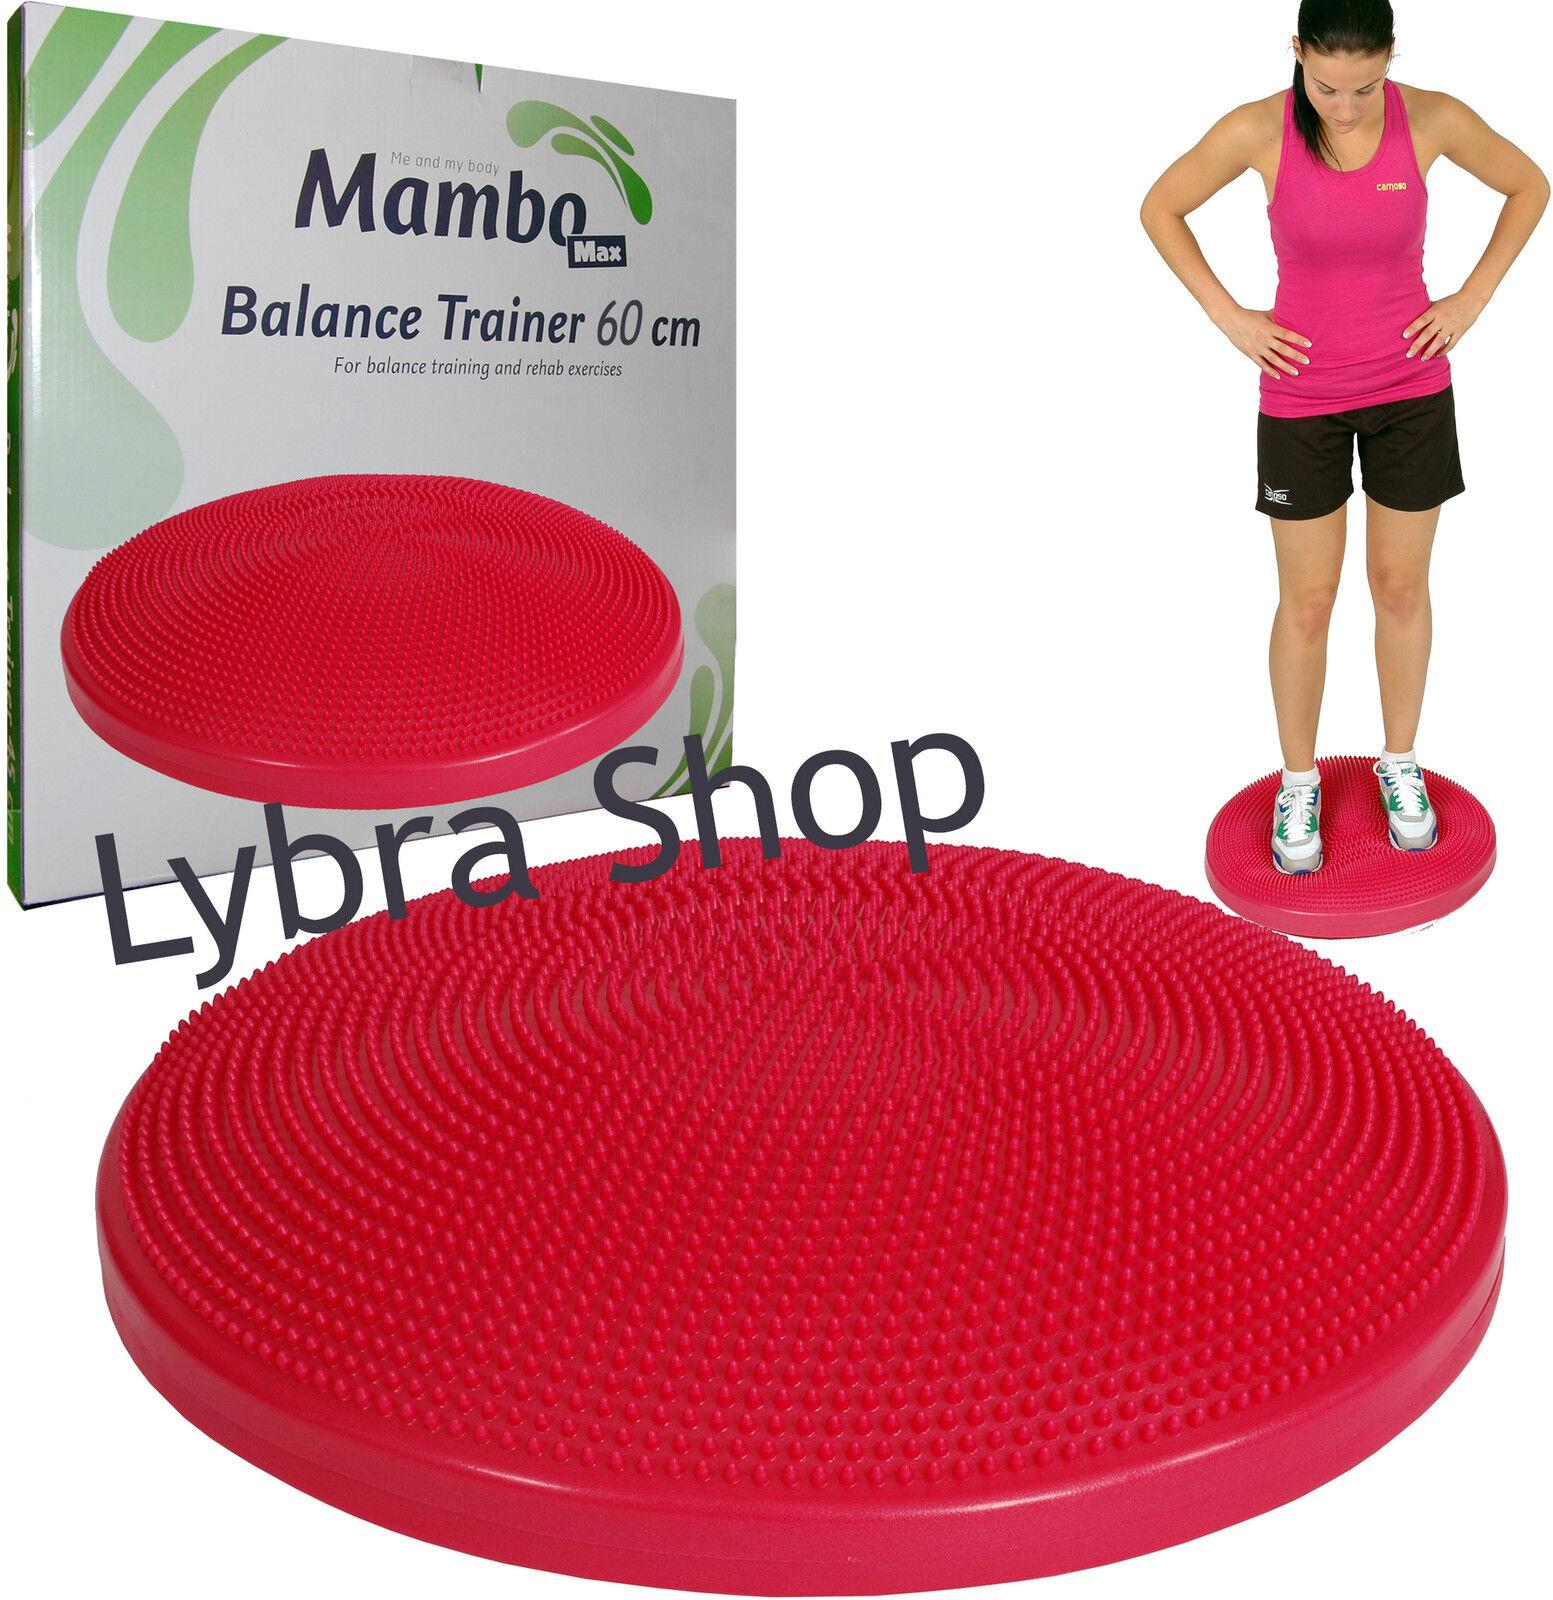 Cuscino Ad Aria Fitness.Msd Balance Trainer 60cm Red Cuscino Aria Equilibrio Coordinazion